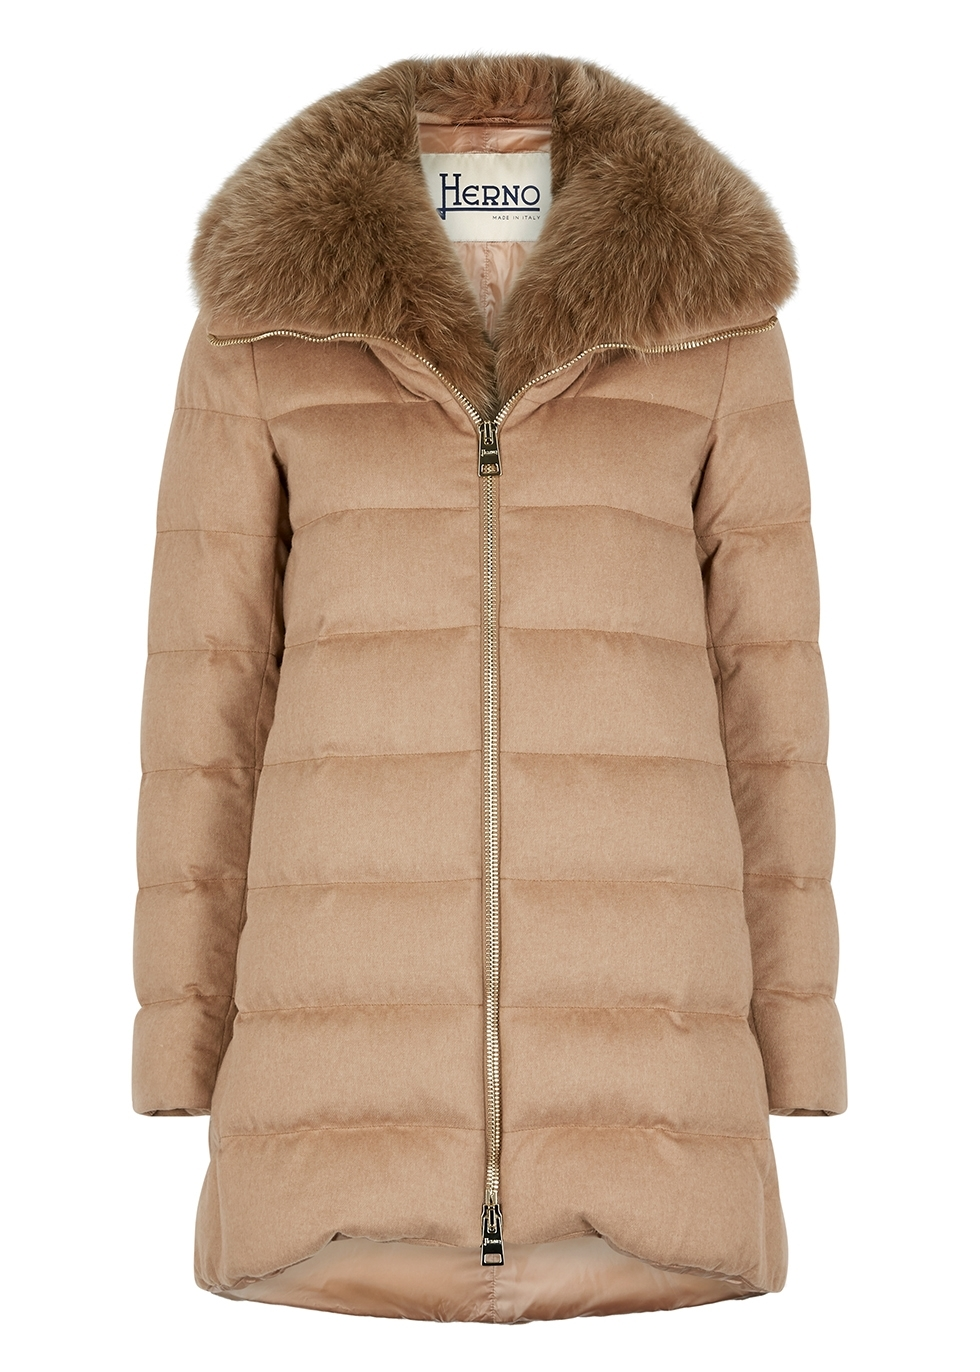 403be8272741 Designer Coats - Women's Winter Coats - Harvey Nichols